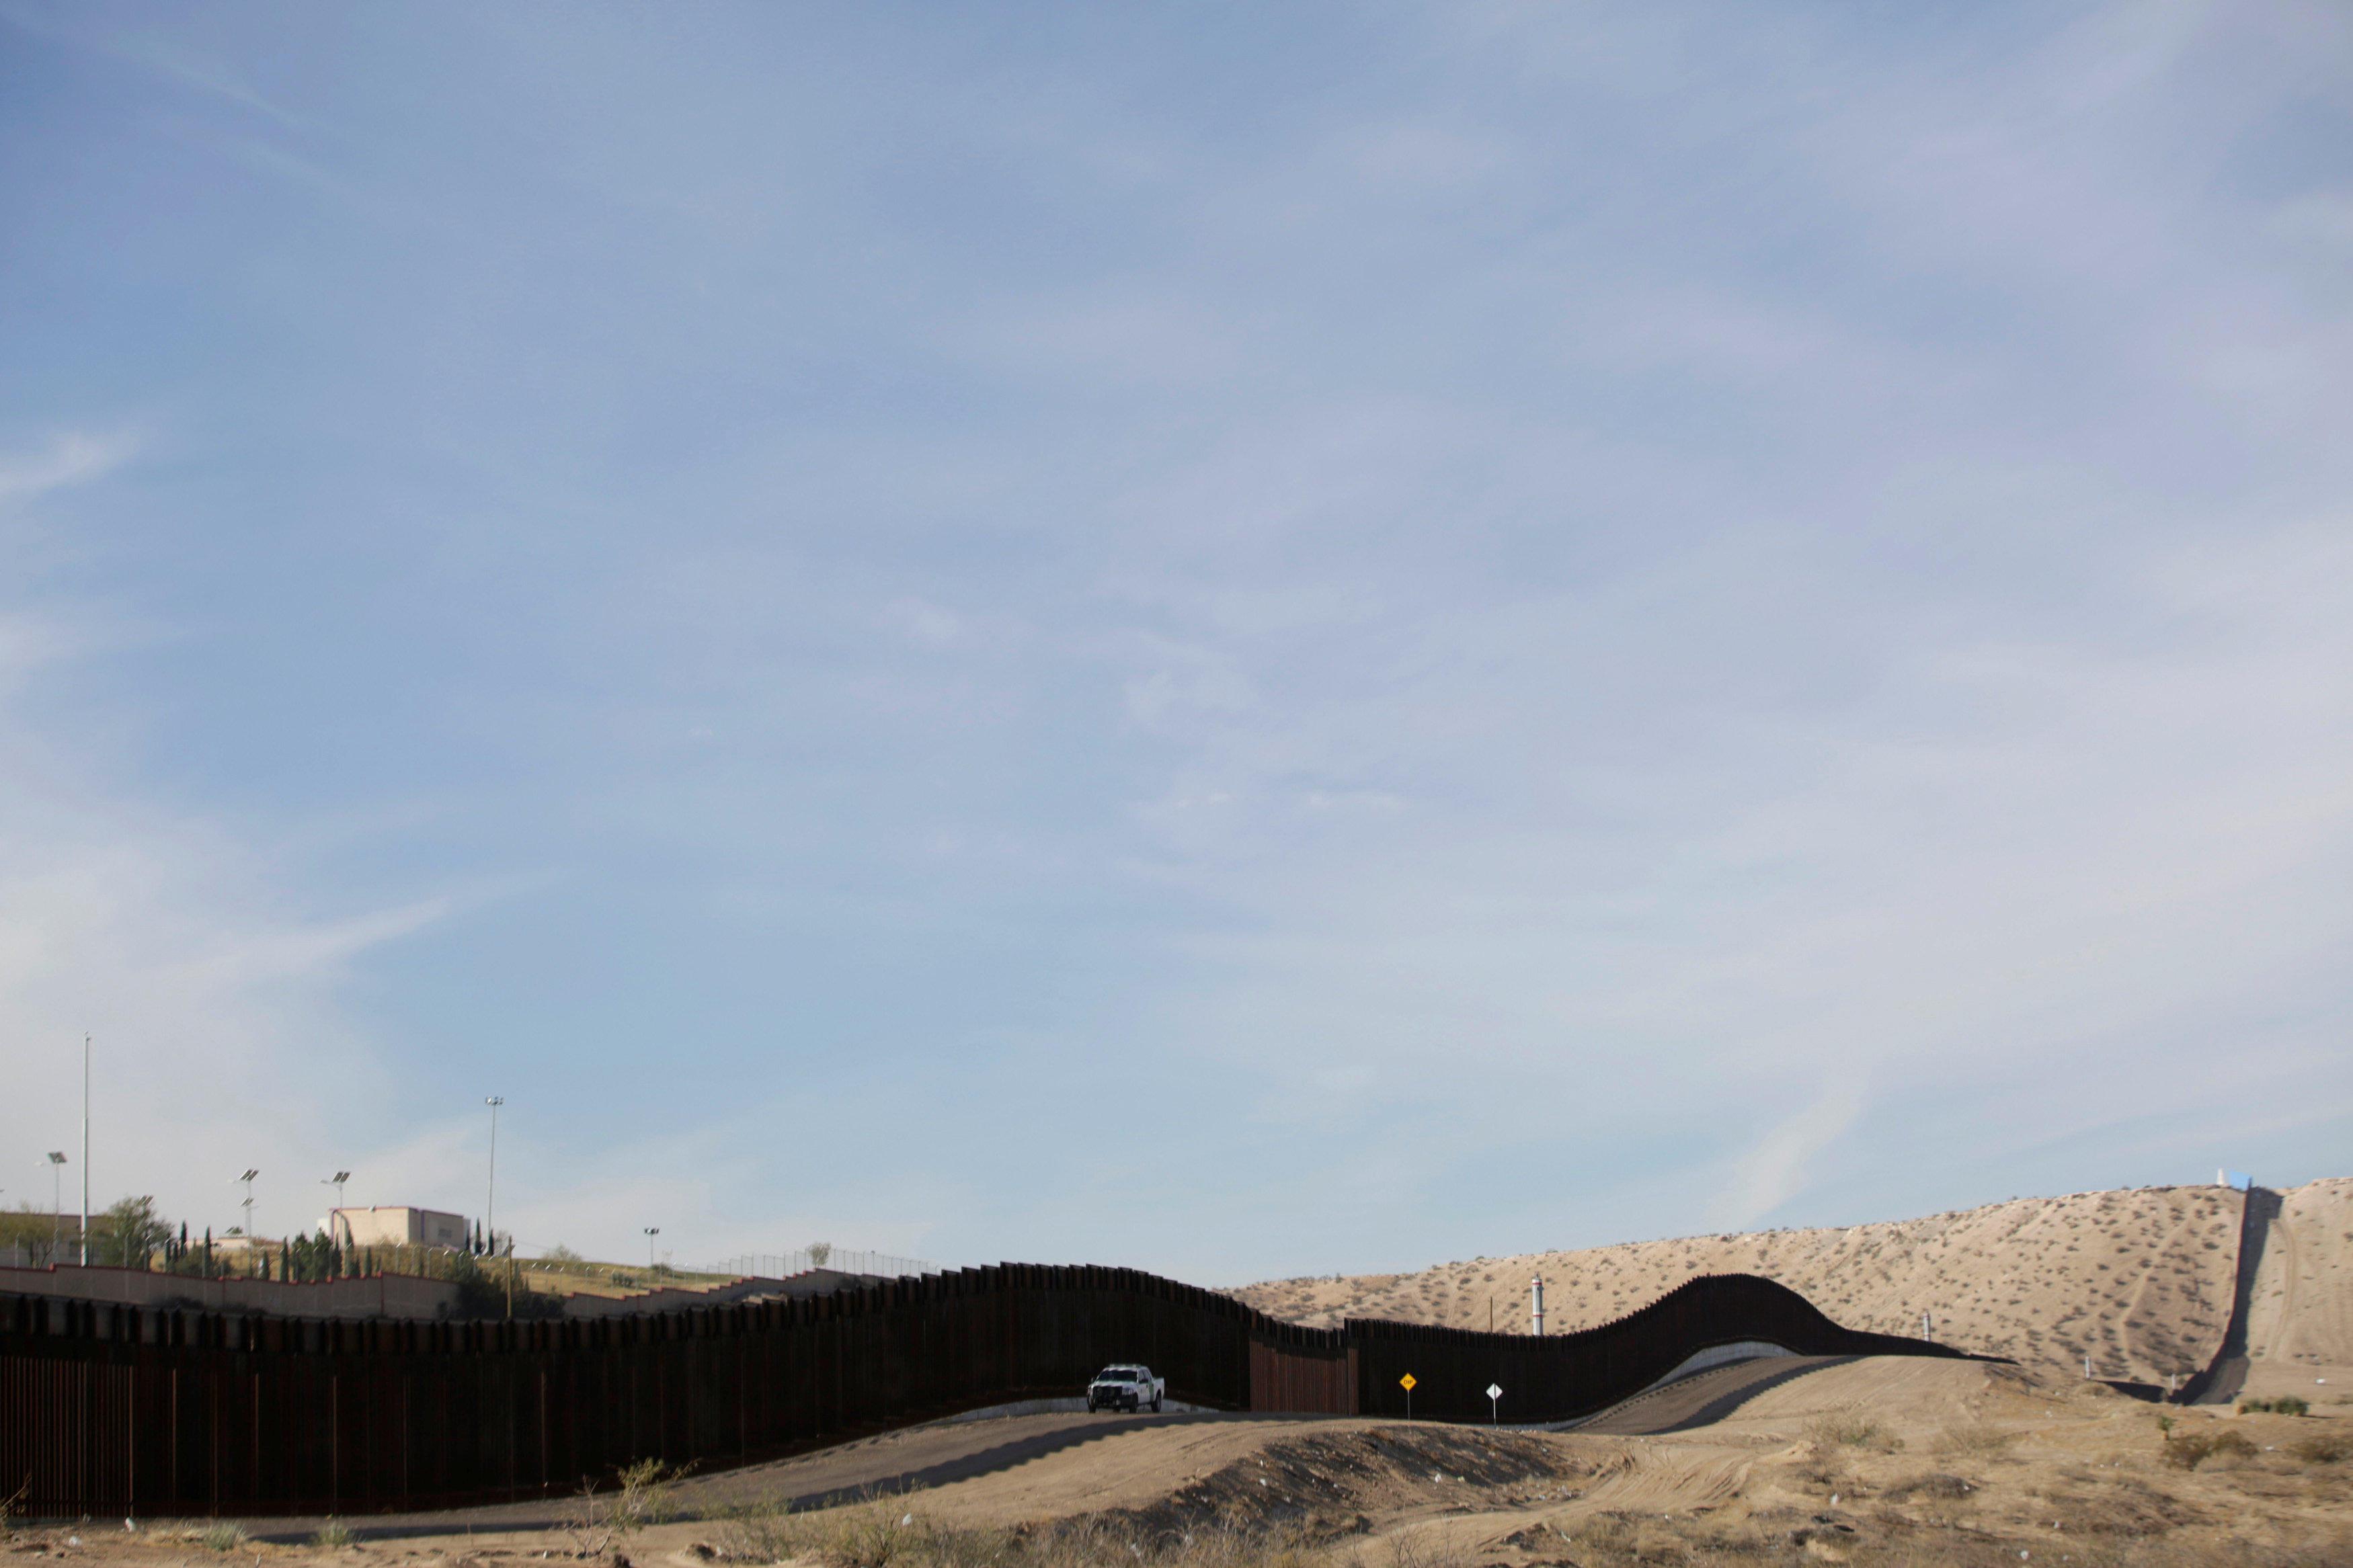 Arrests along the U S -Mexico border surge - CBS News